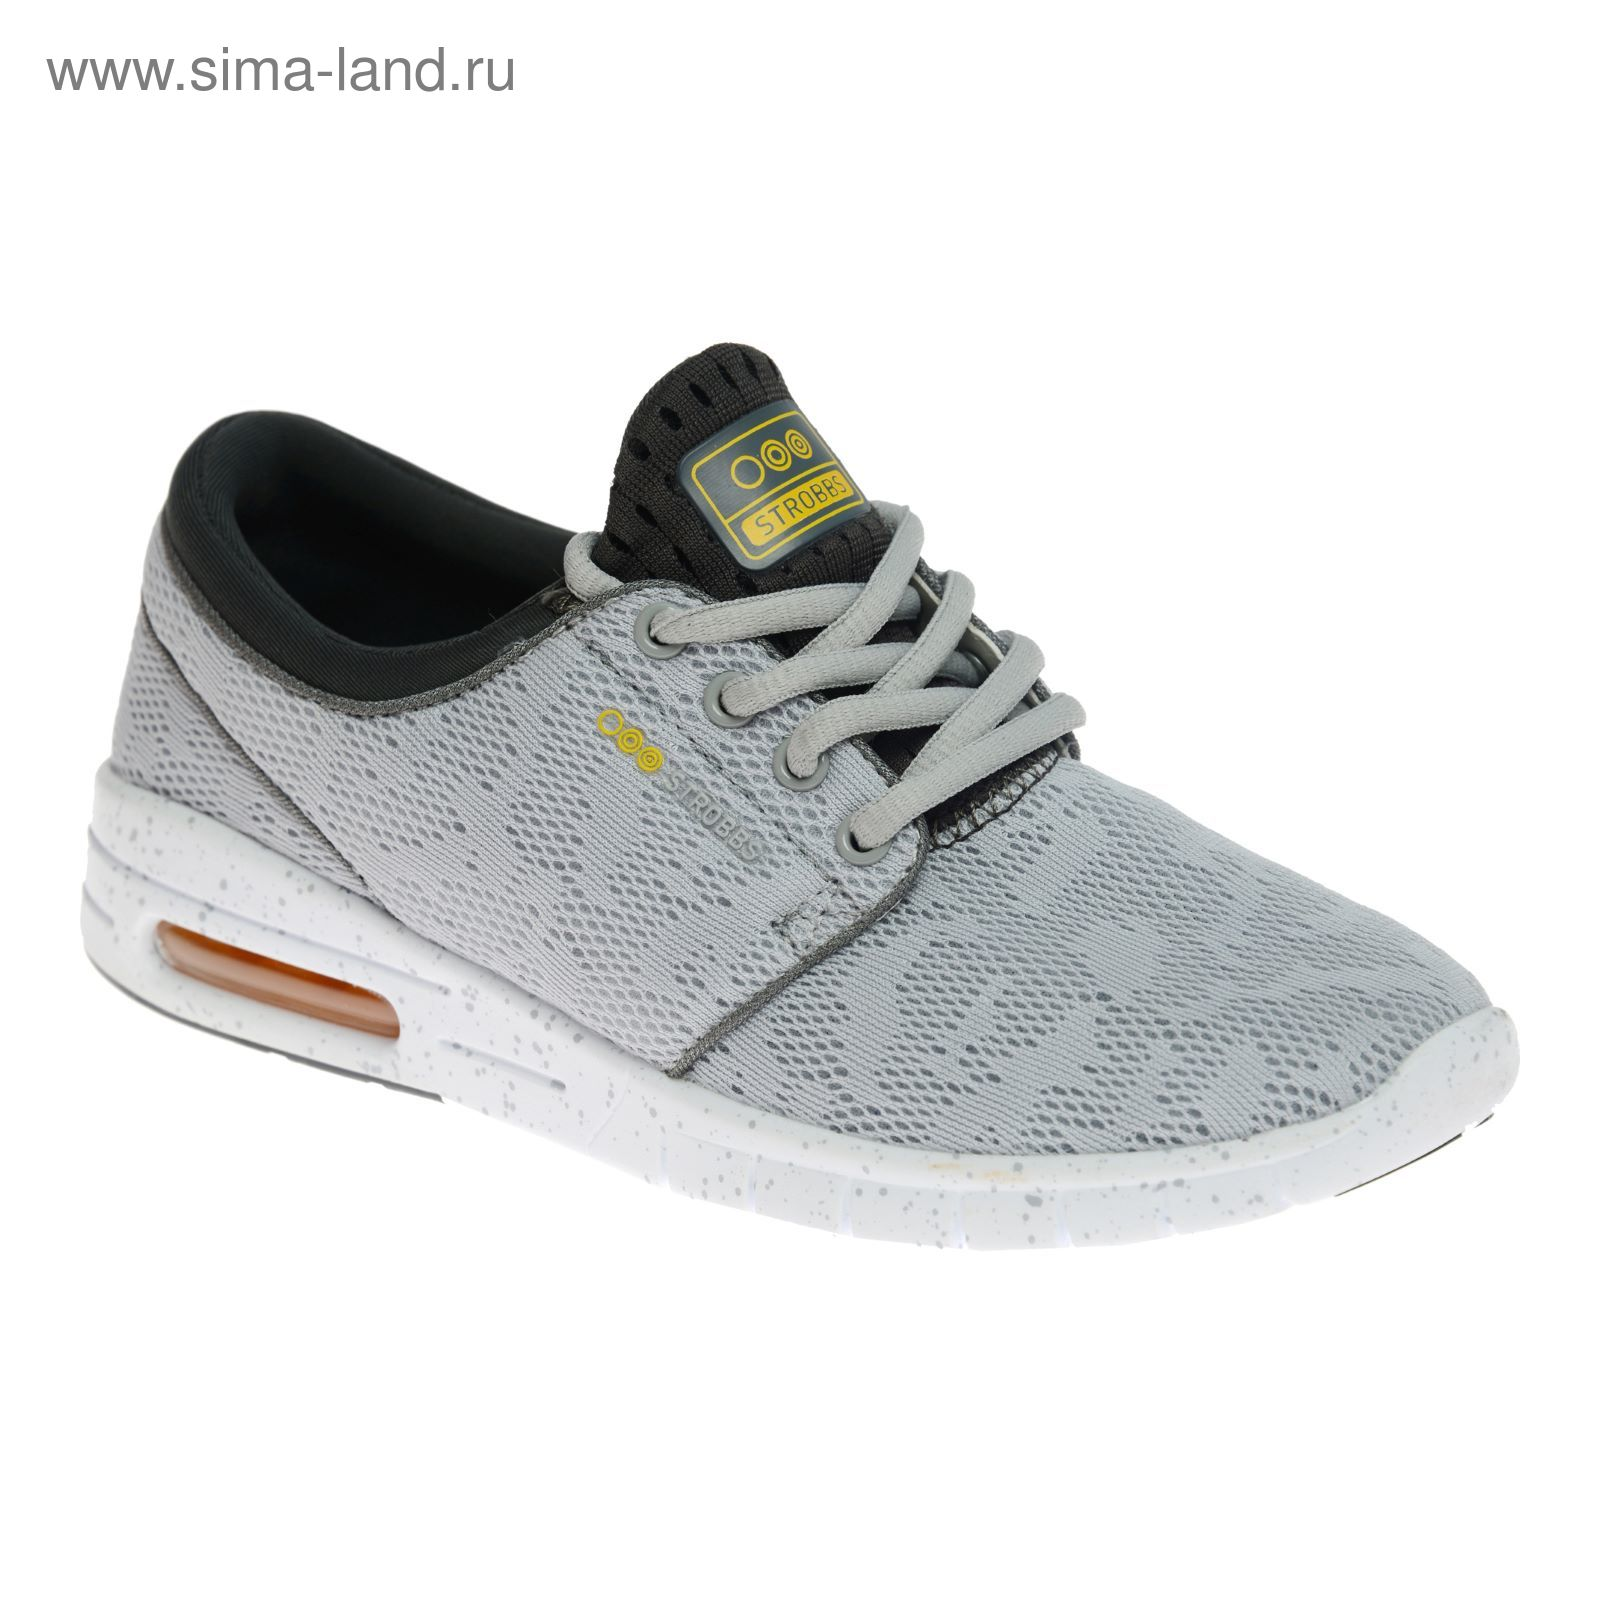 Кроссовки женские STROBBS, цвет серый, размер 37 (арт. F6380-4 ... 2eba1882d5d